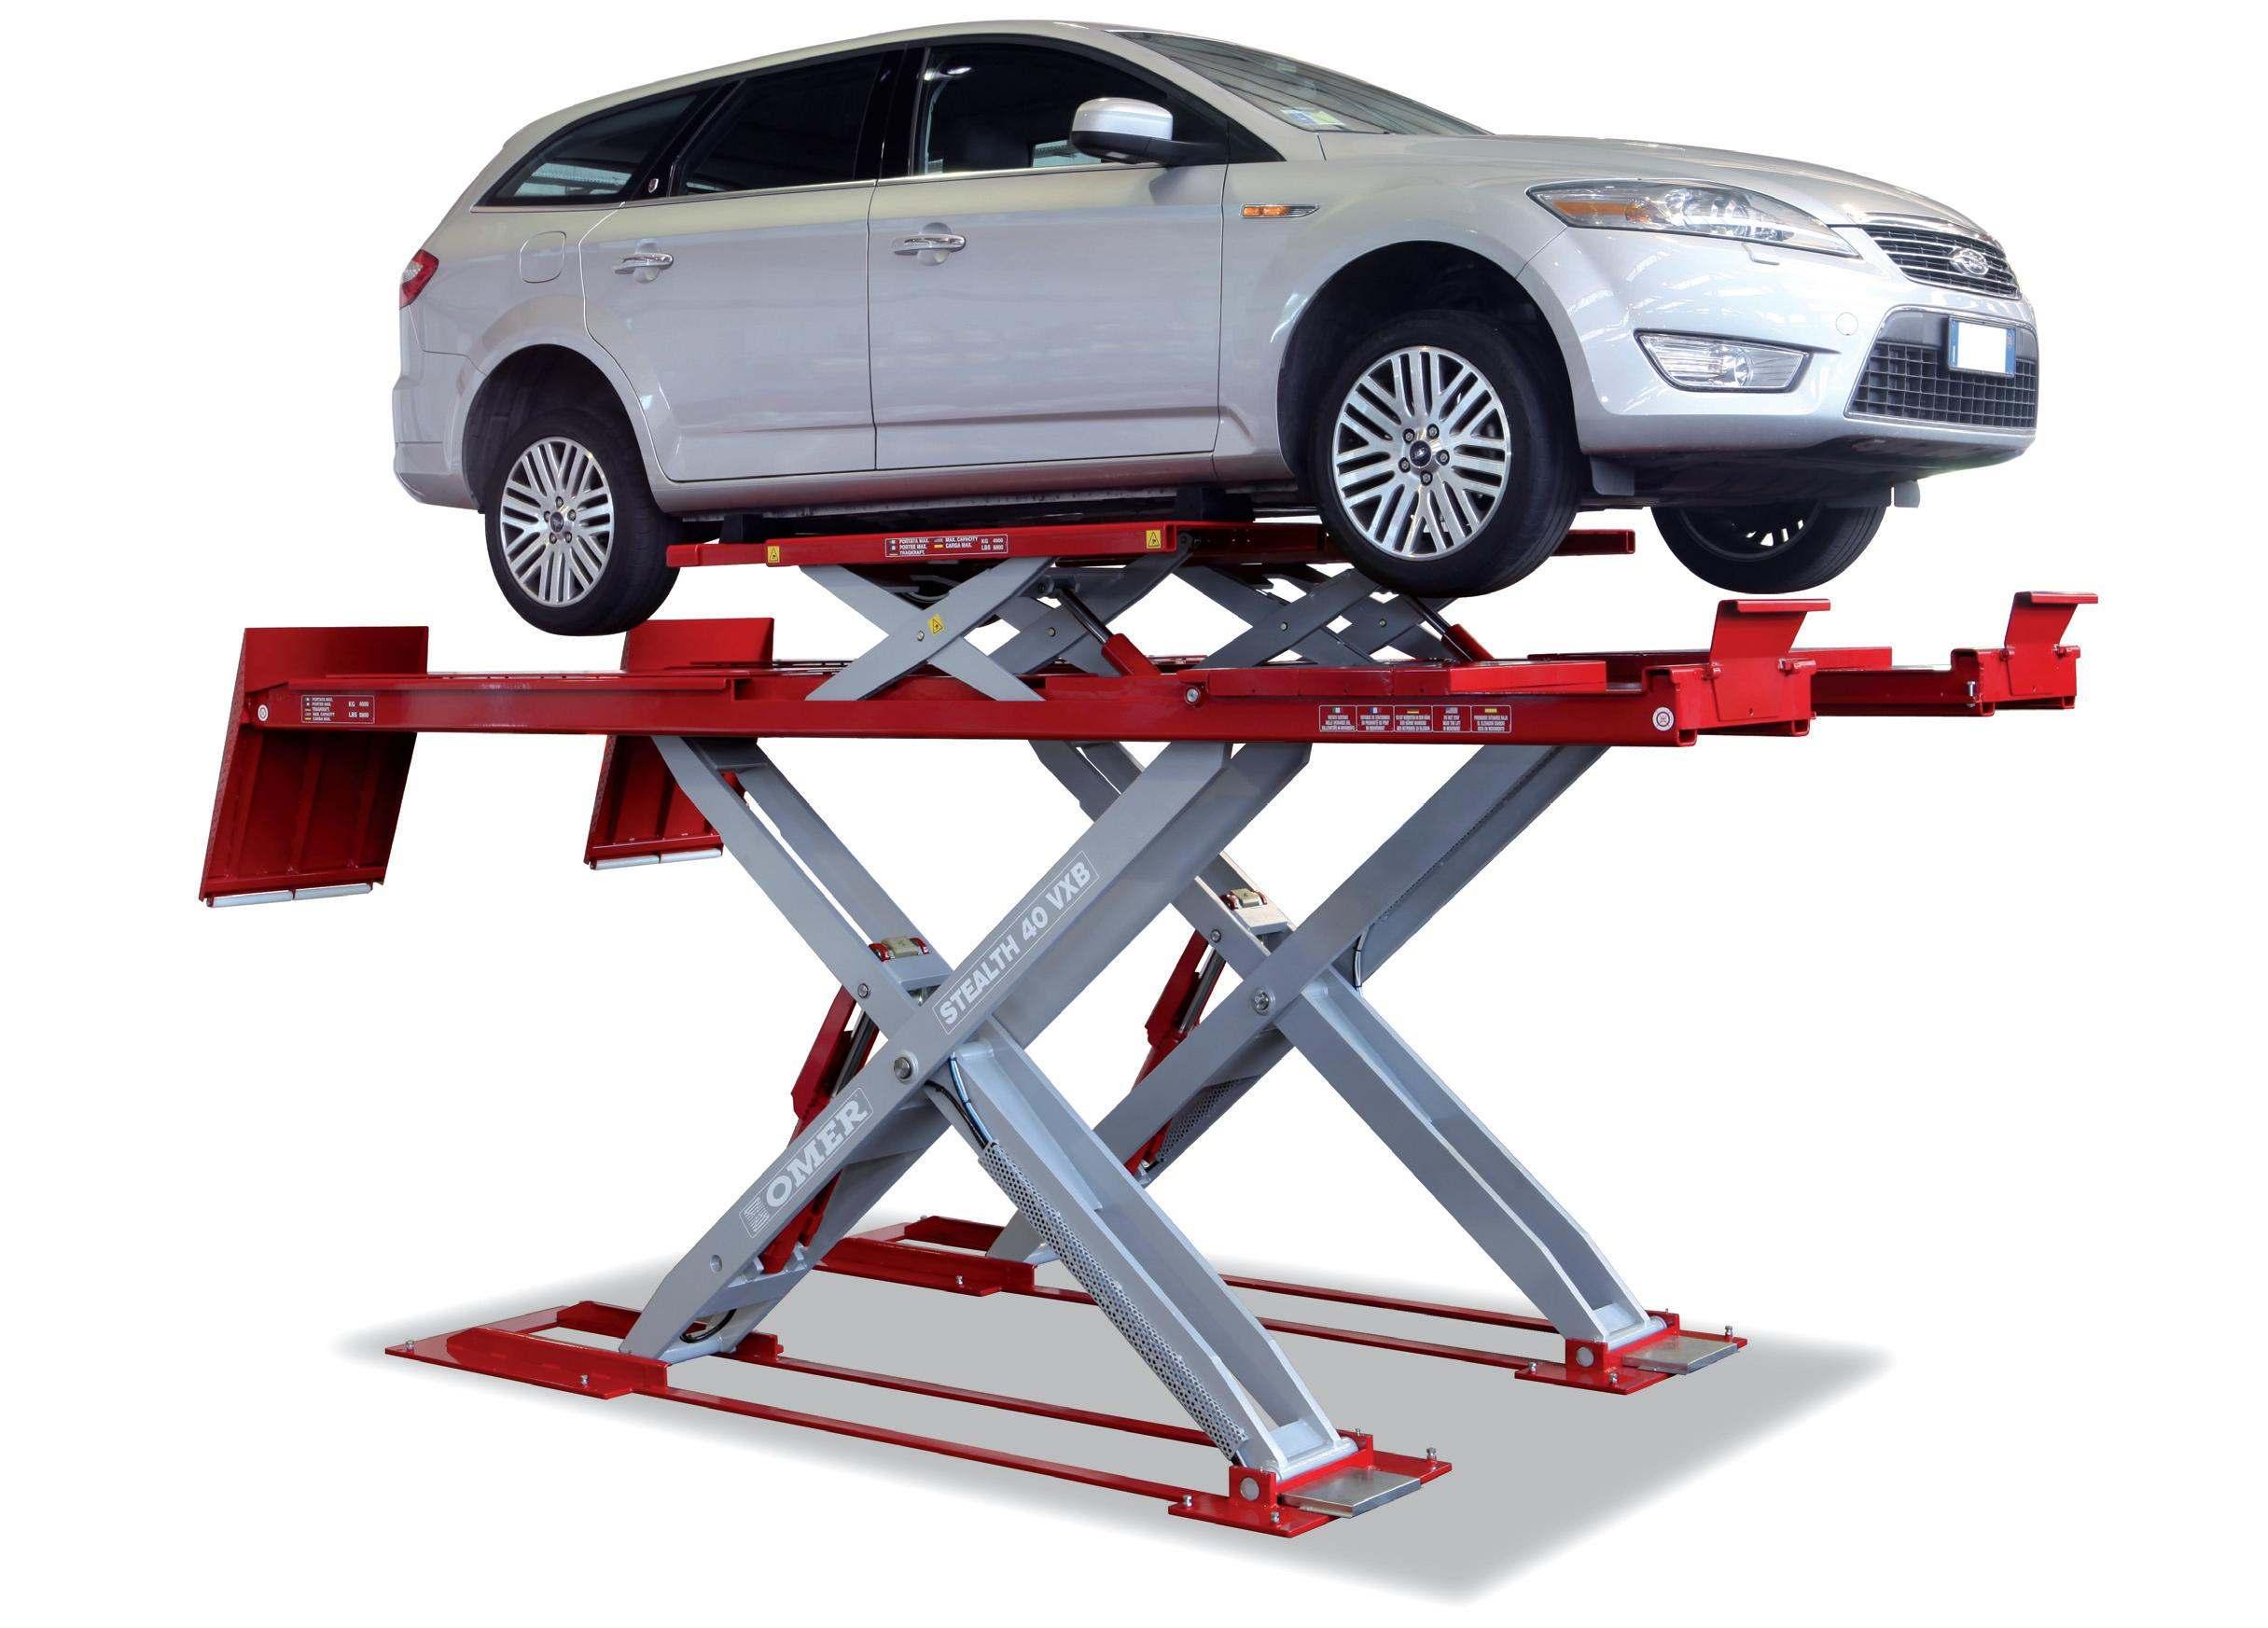 Small Car Low Height 24 Hydraulic Scissor Lift